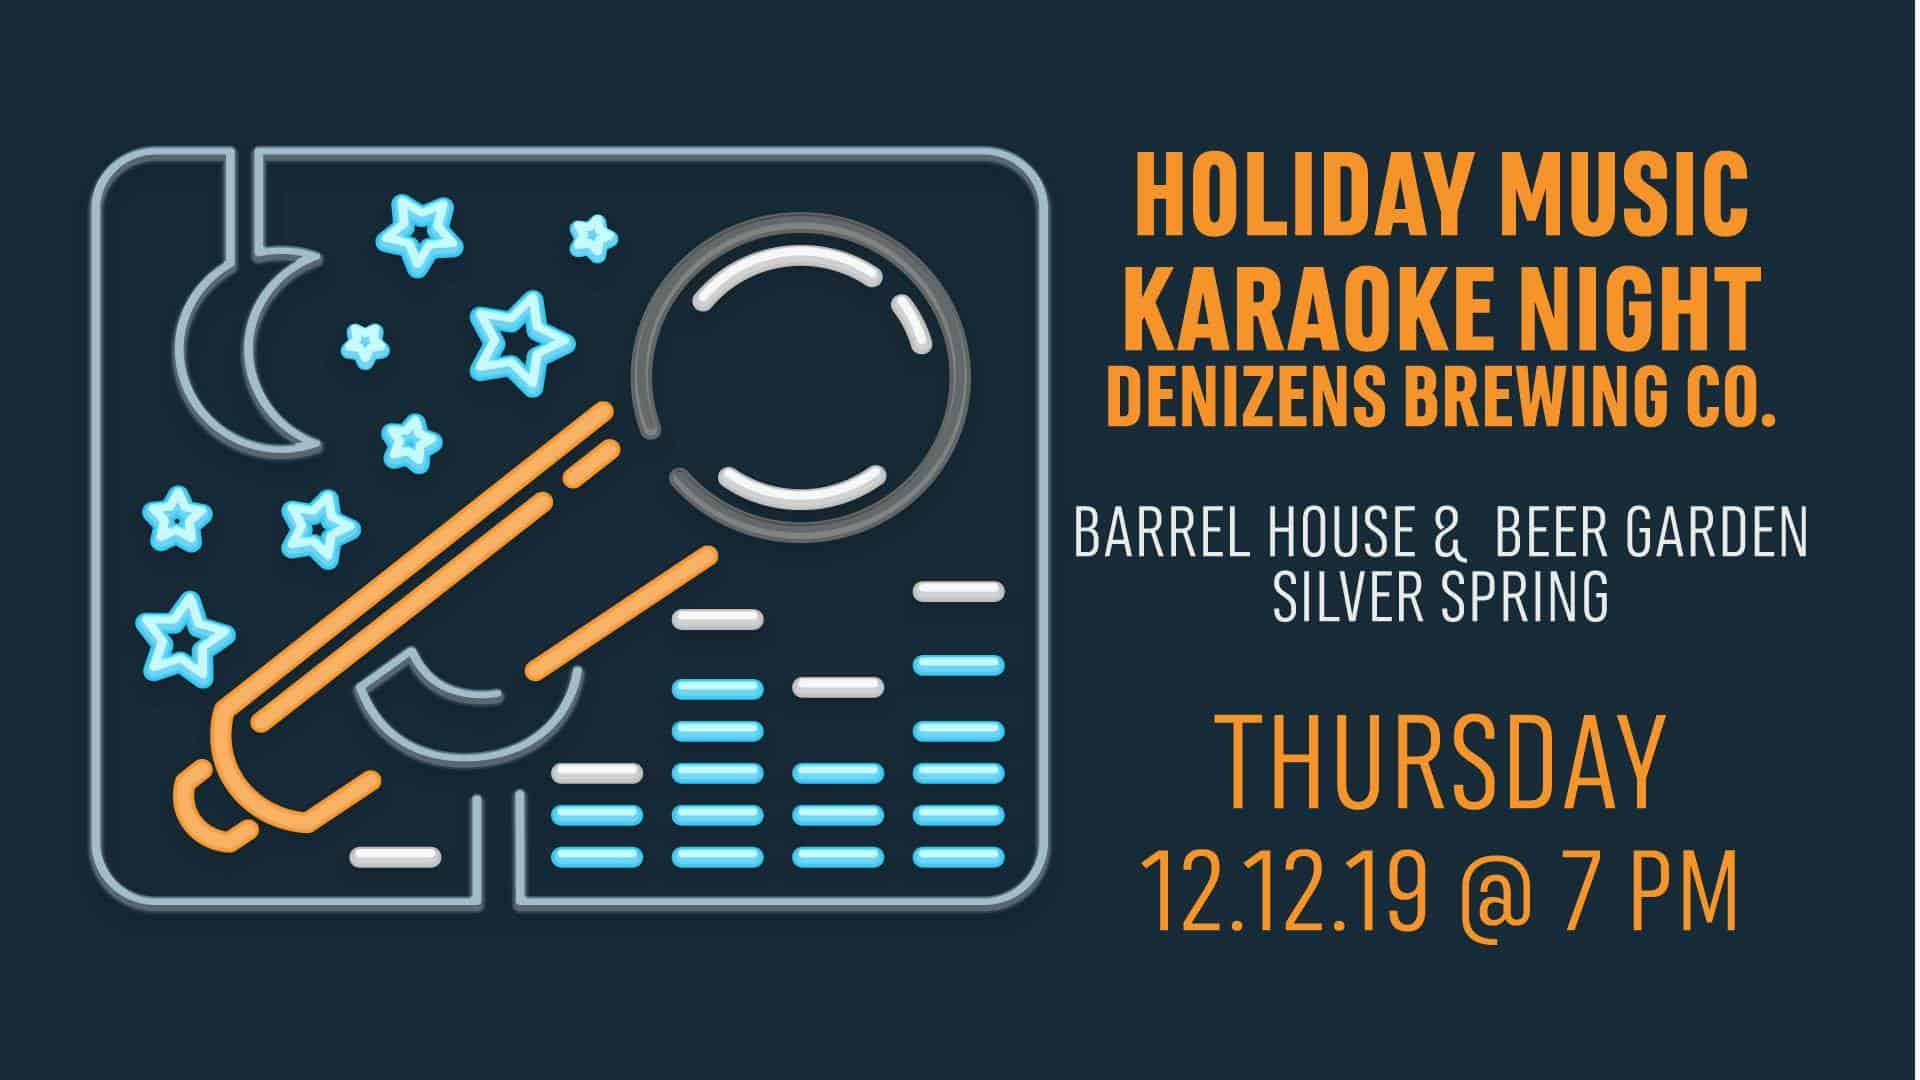 Holiday Music Karaoke @ Denizens